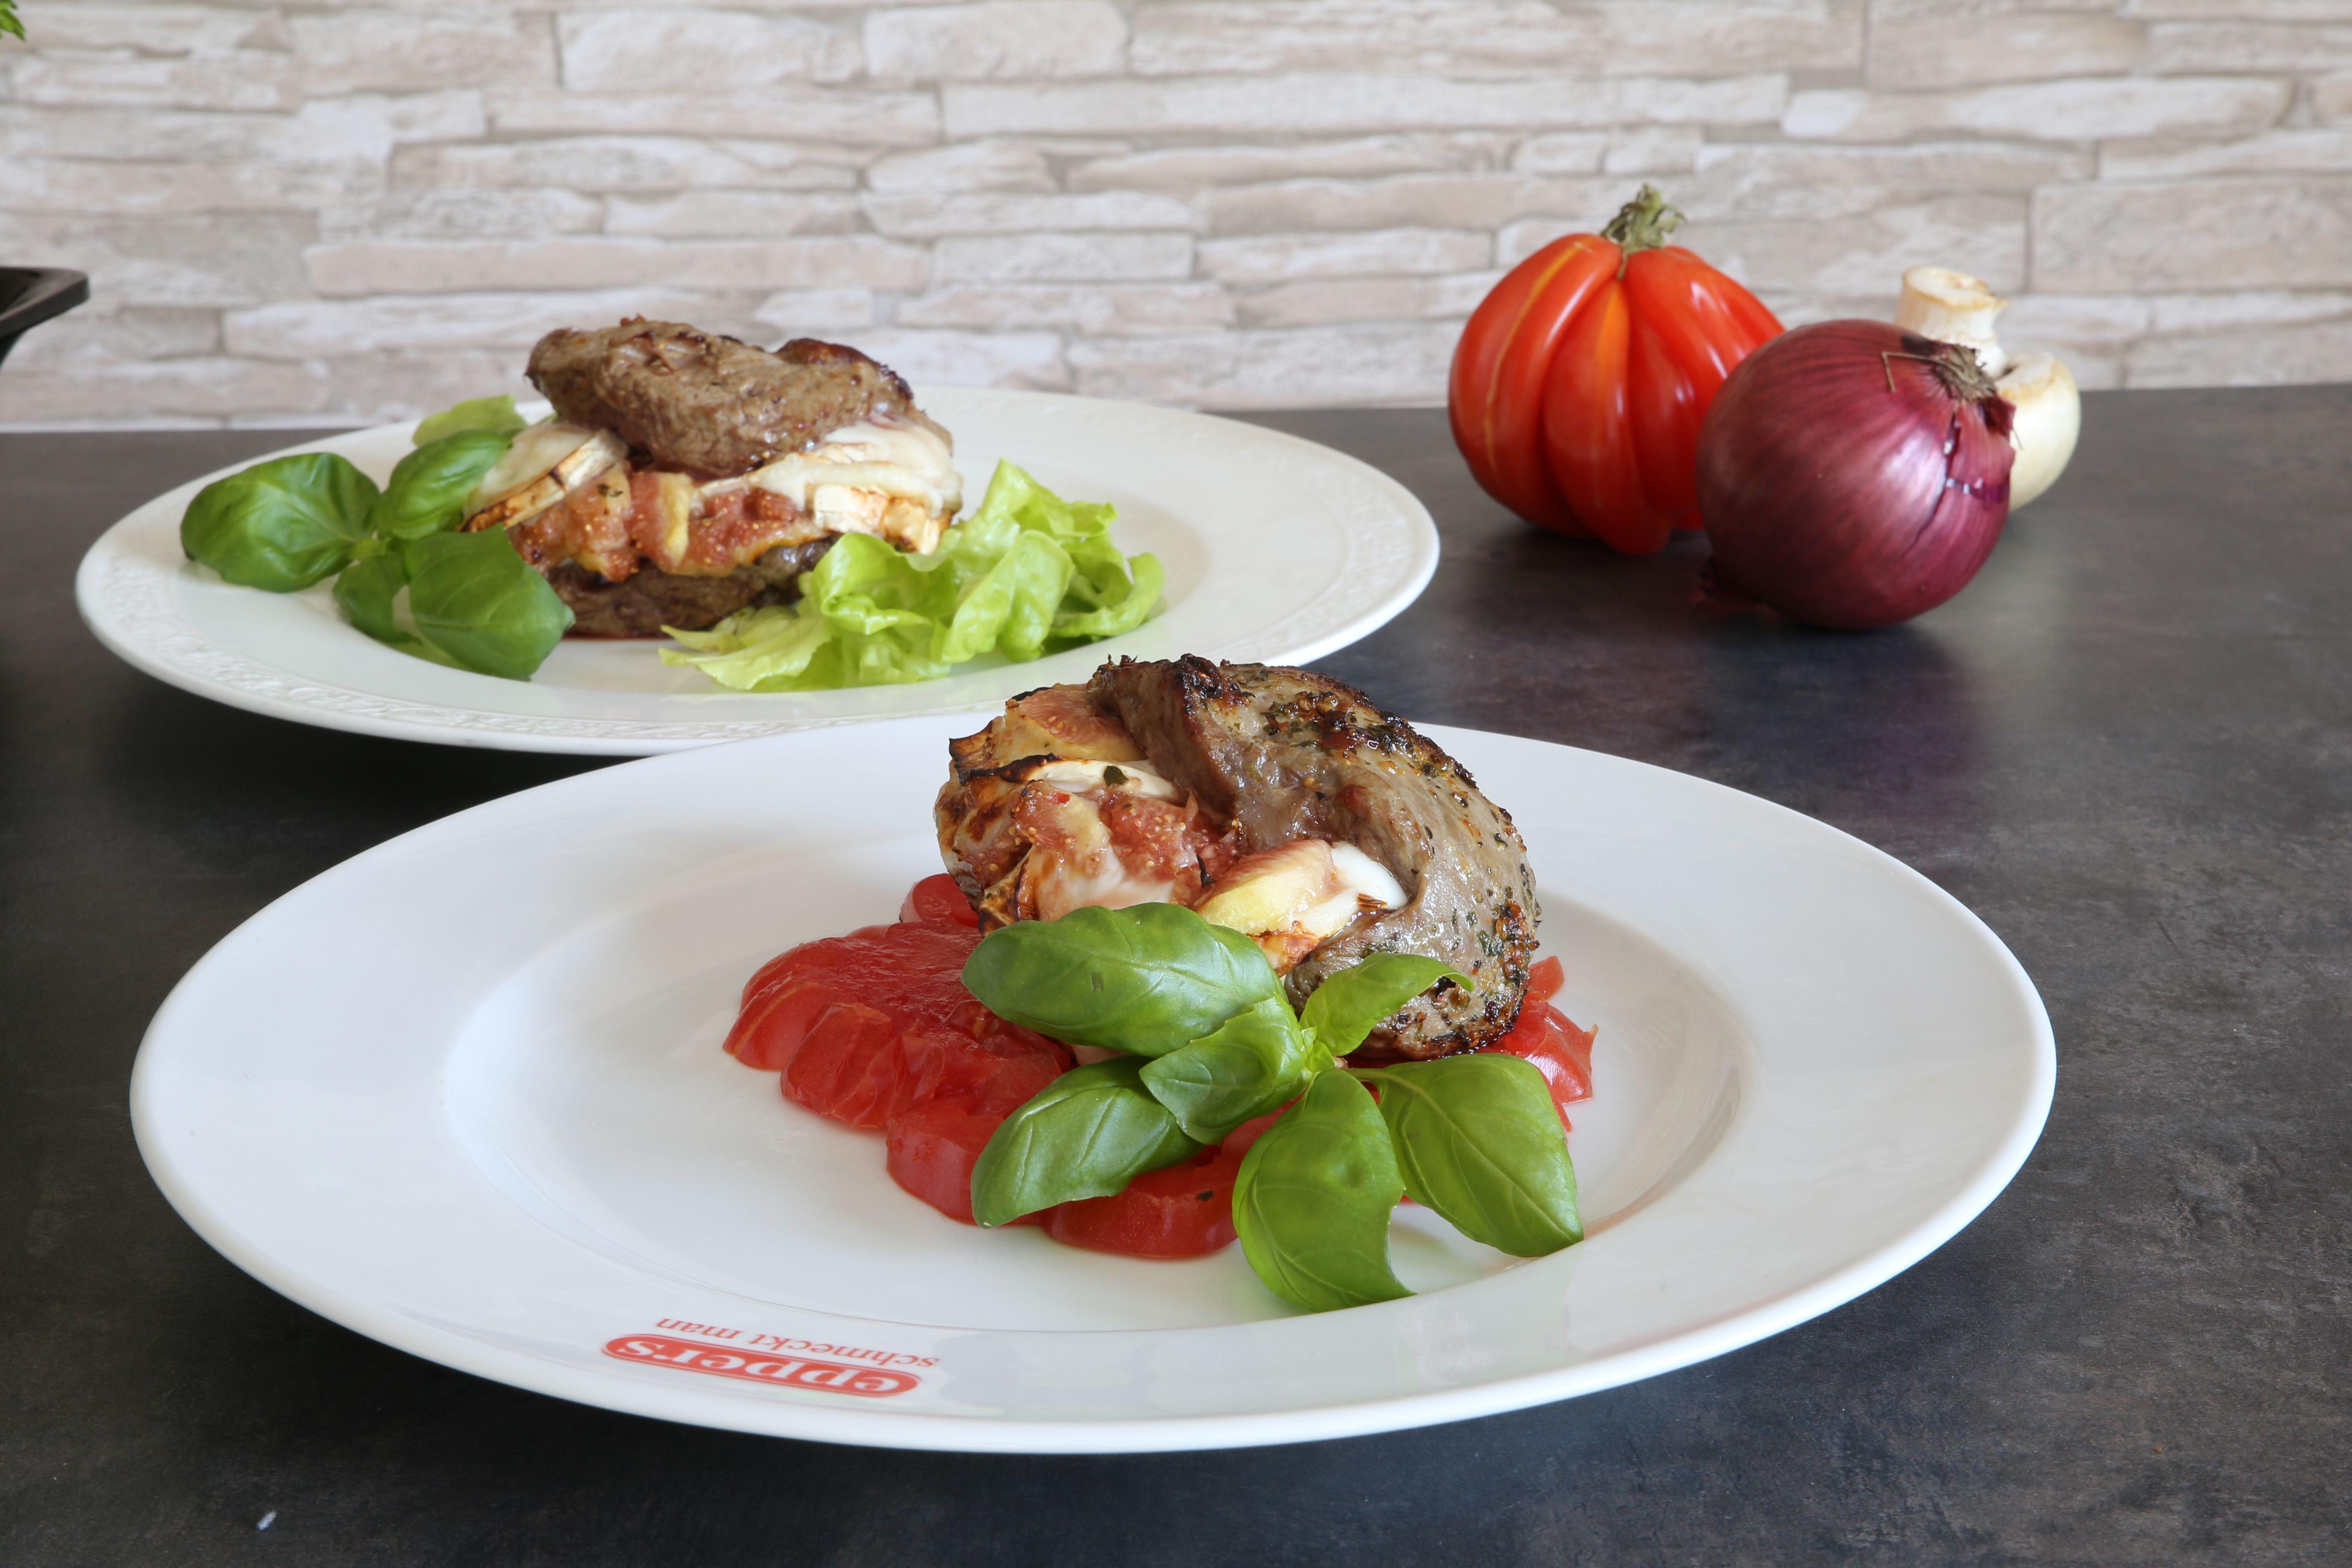 Lammtaschen mit Ziegen-Camembert und Feigen, 2 Verzier-Varianten